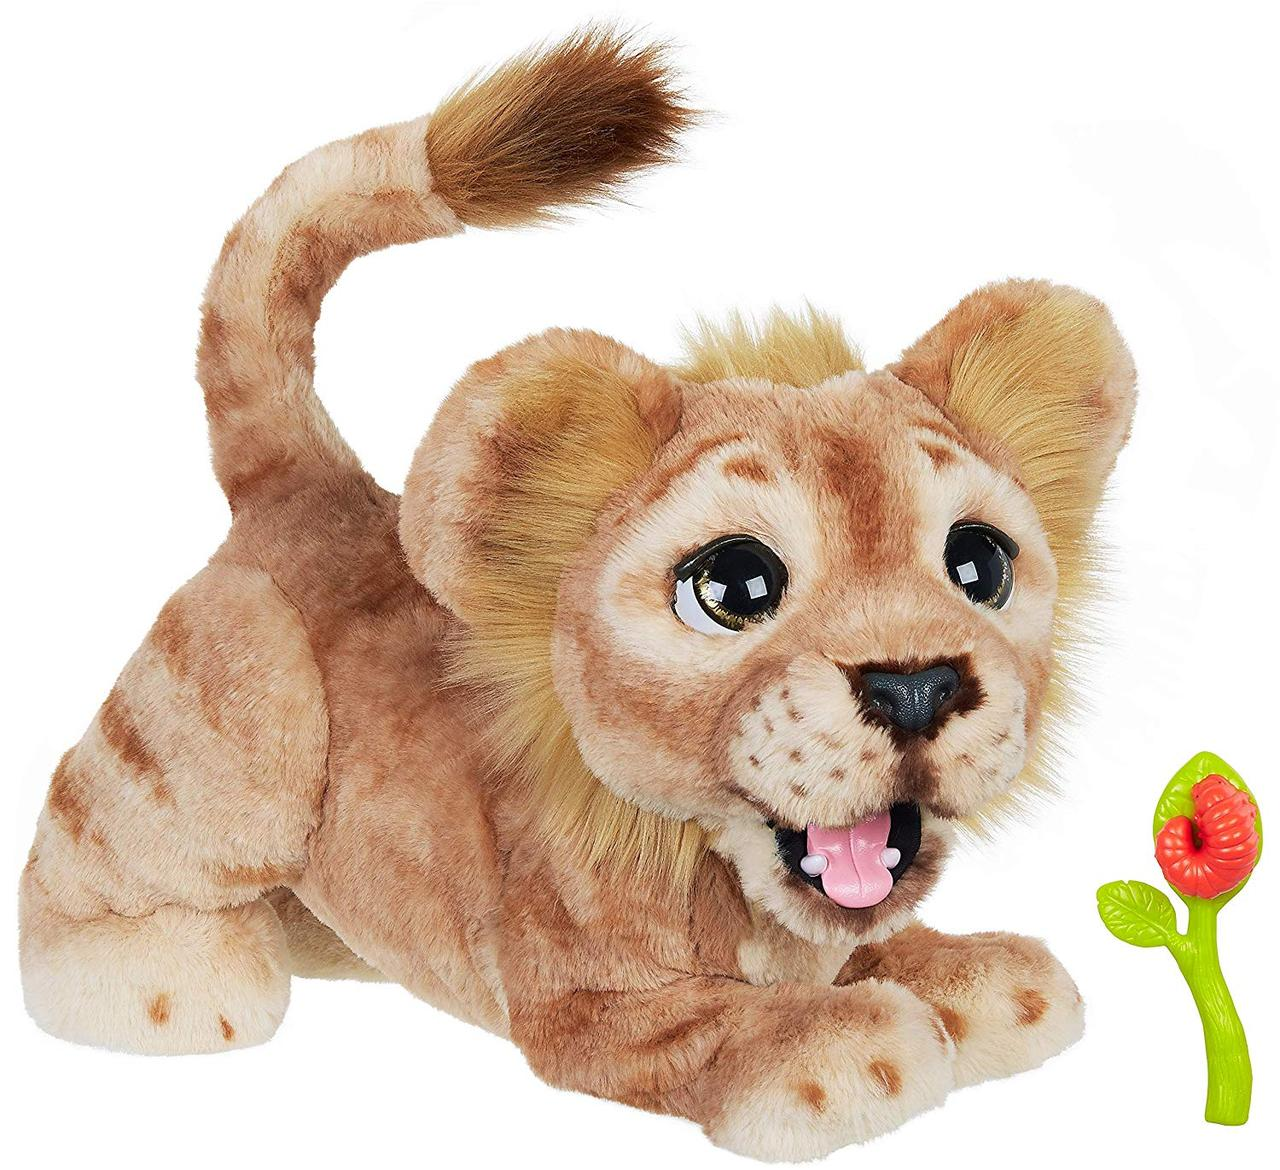 Интерактивный тигренок  Король Лев Симба Hasbro FurReal Friends Disney The Lion King Mighty Roar Simba